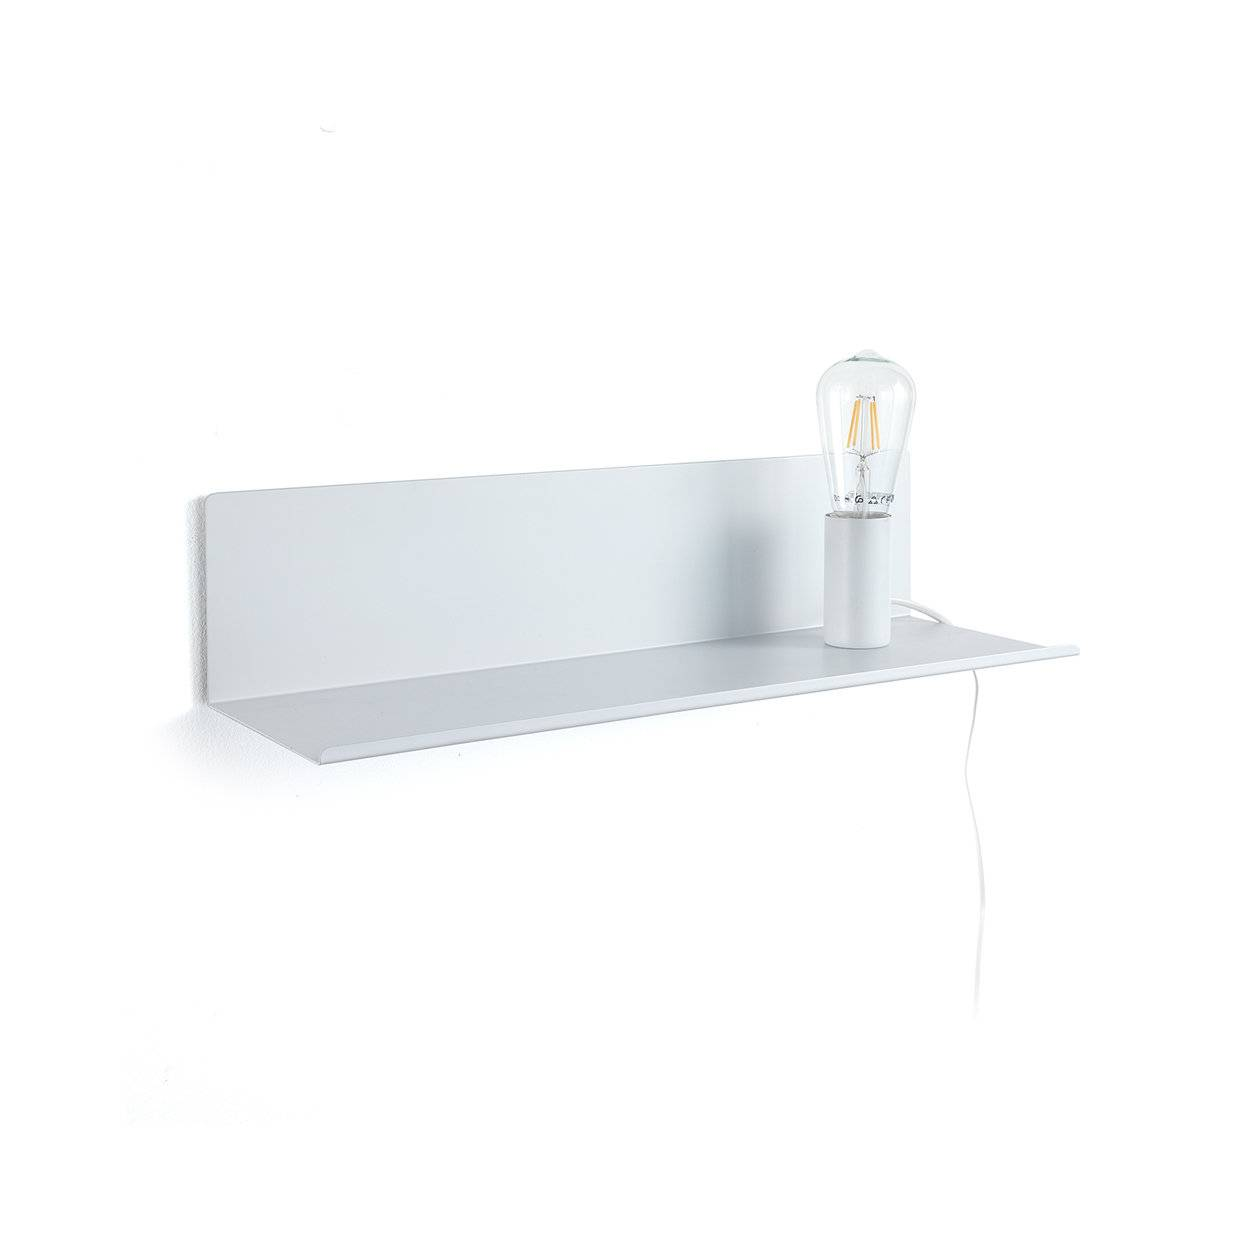 speciale luce by tomasucci lampada / mensola / comodino magic shelf, bianco